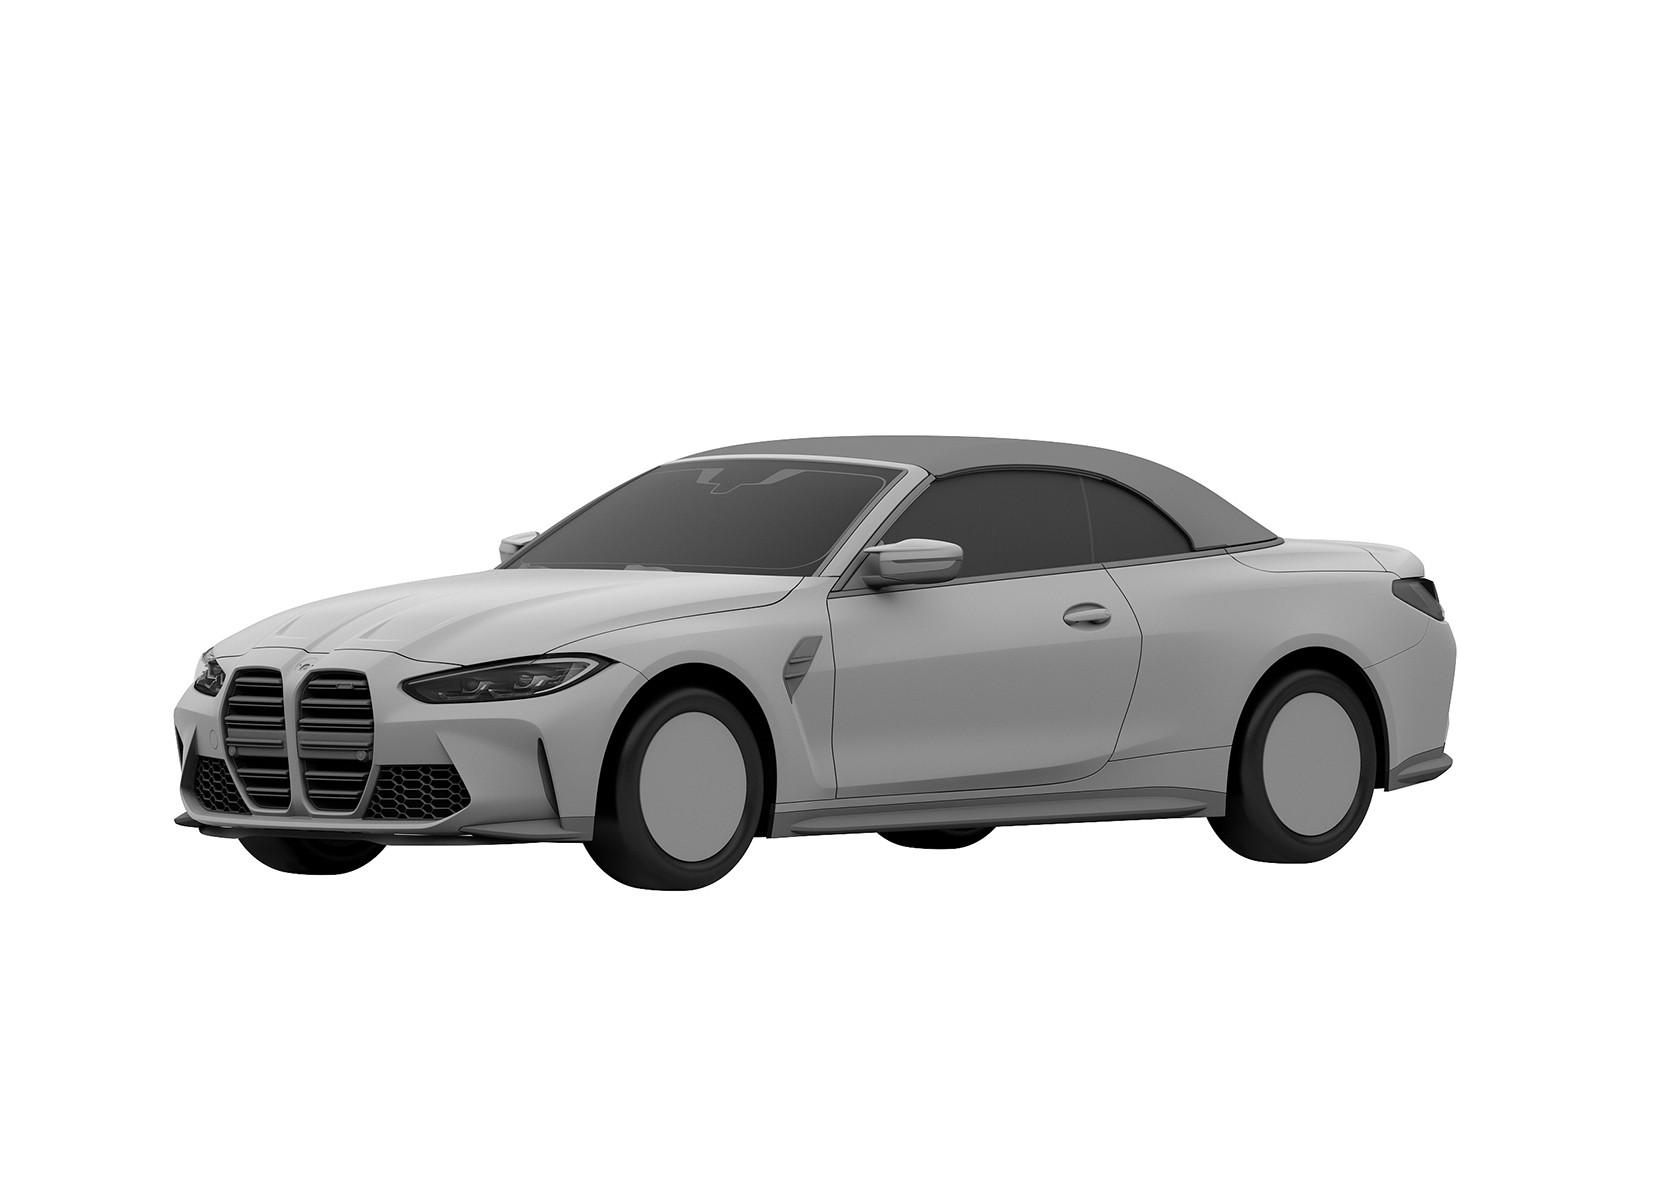 BMW-M4-Convertible-Patent-Photos-1